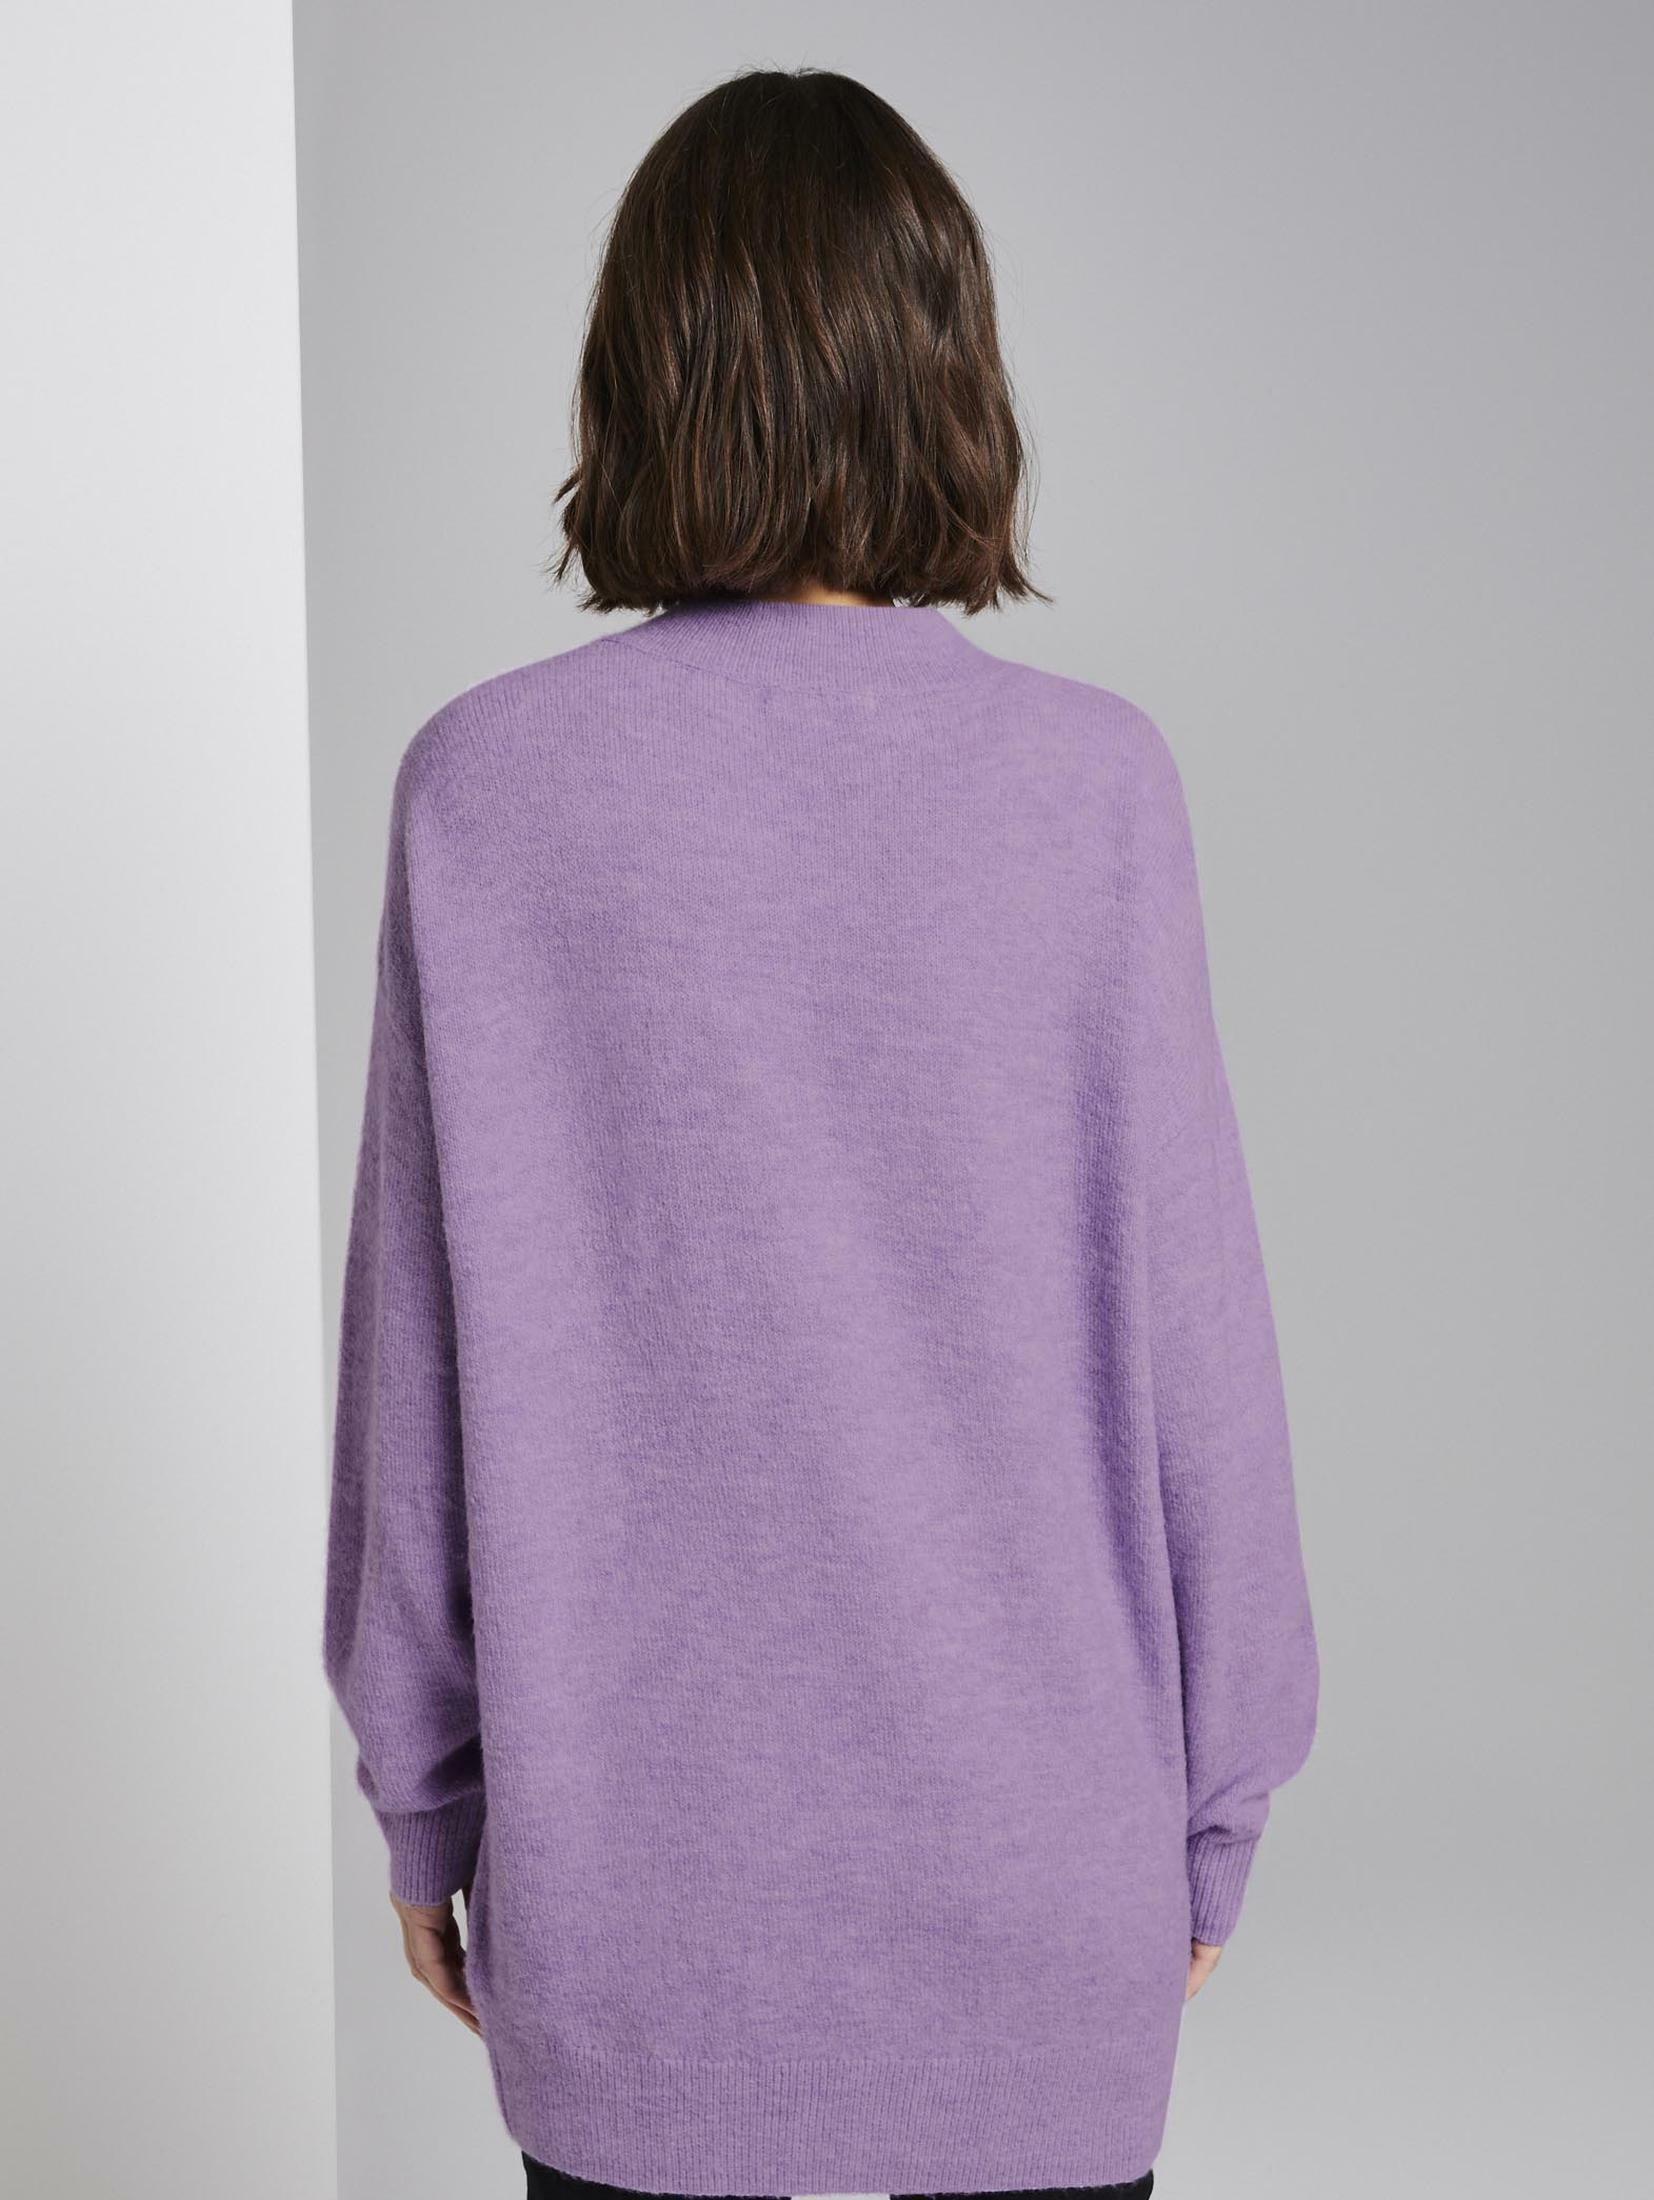 TOM TAILOR Denim Longpullover Strickpullover mit V-Ausschnitt | Bekleidung > Pullover > Longpullover | Tom Tailor Denim